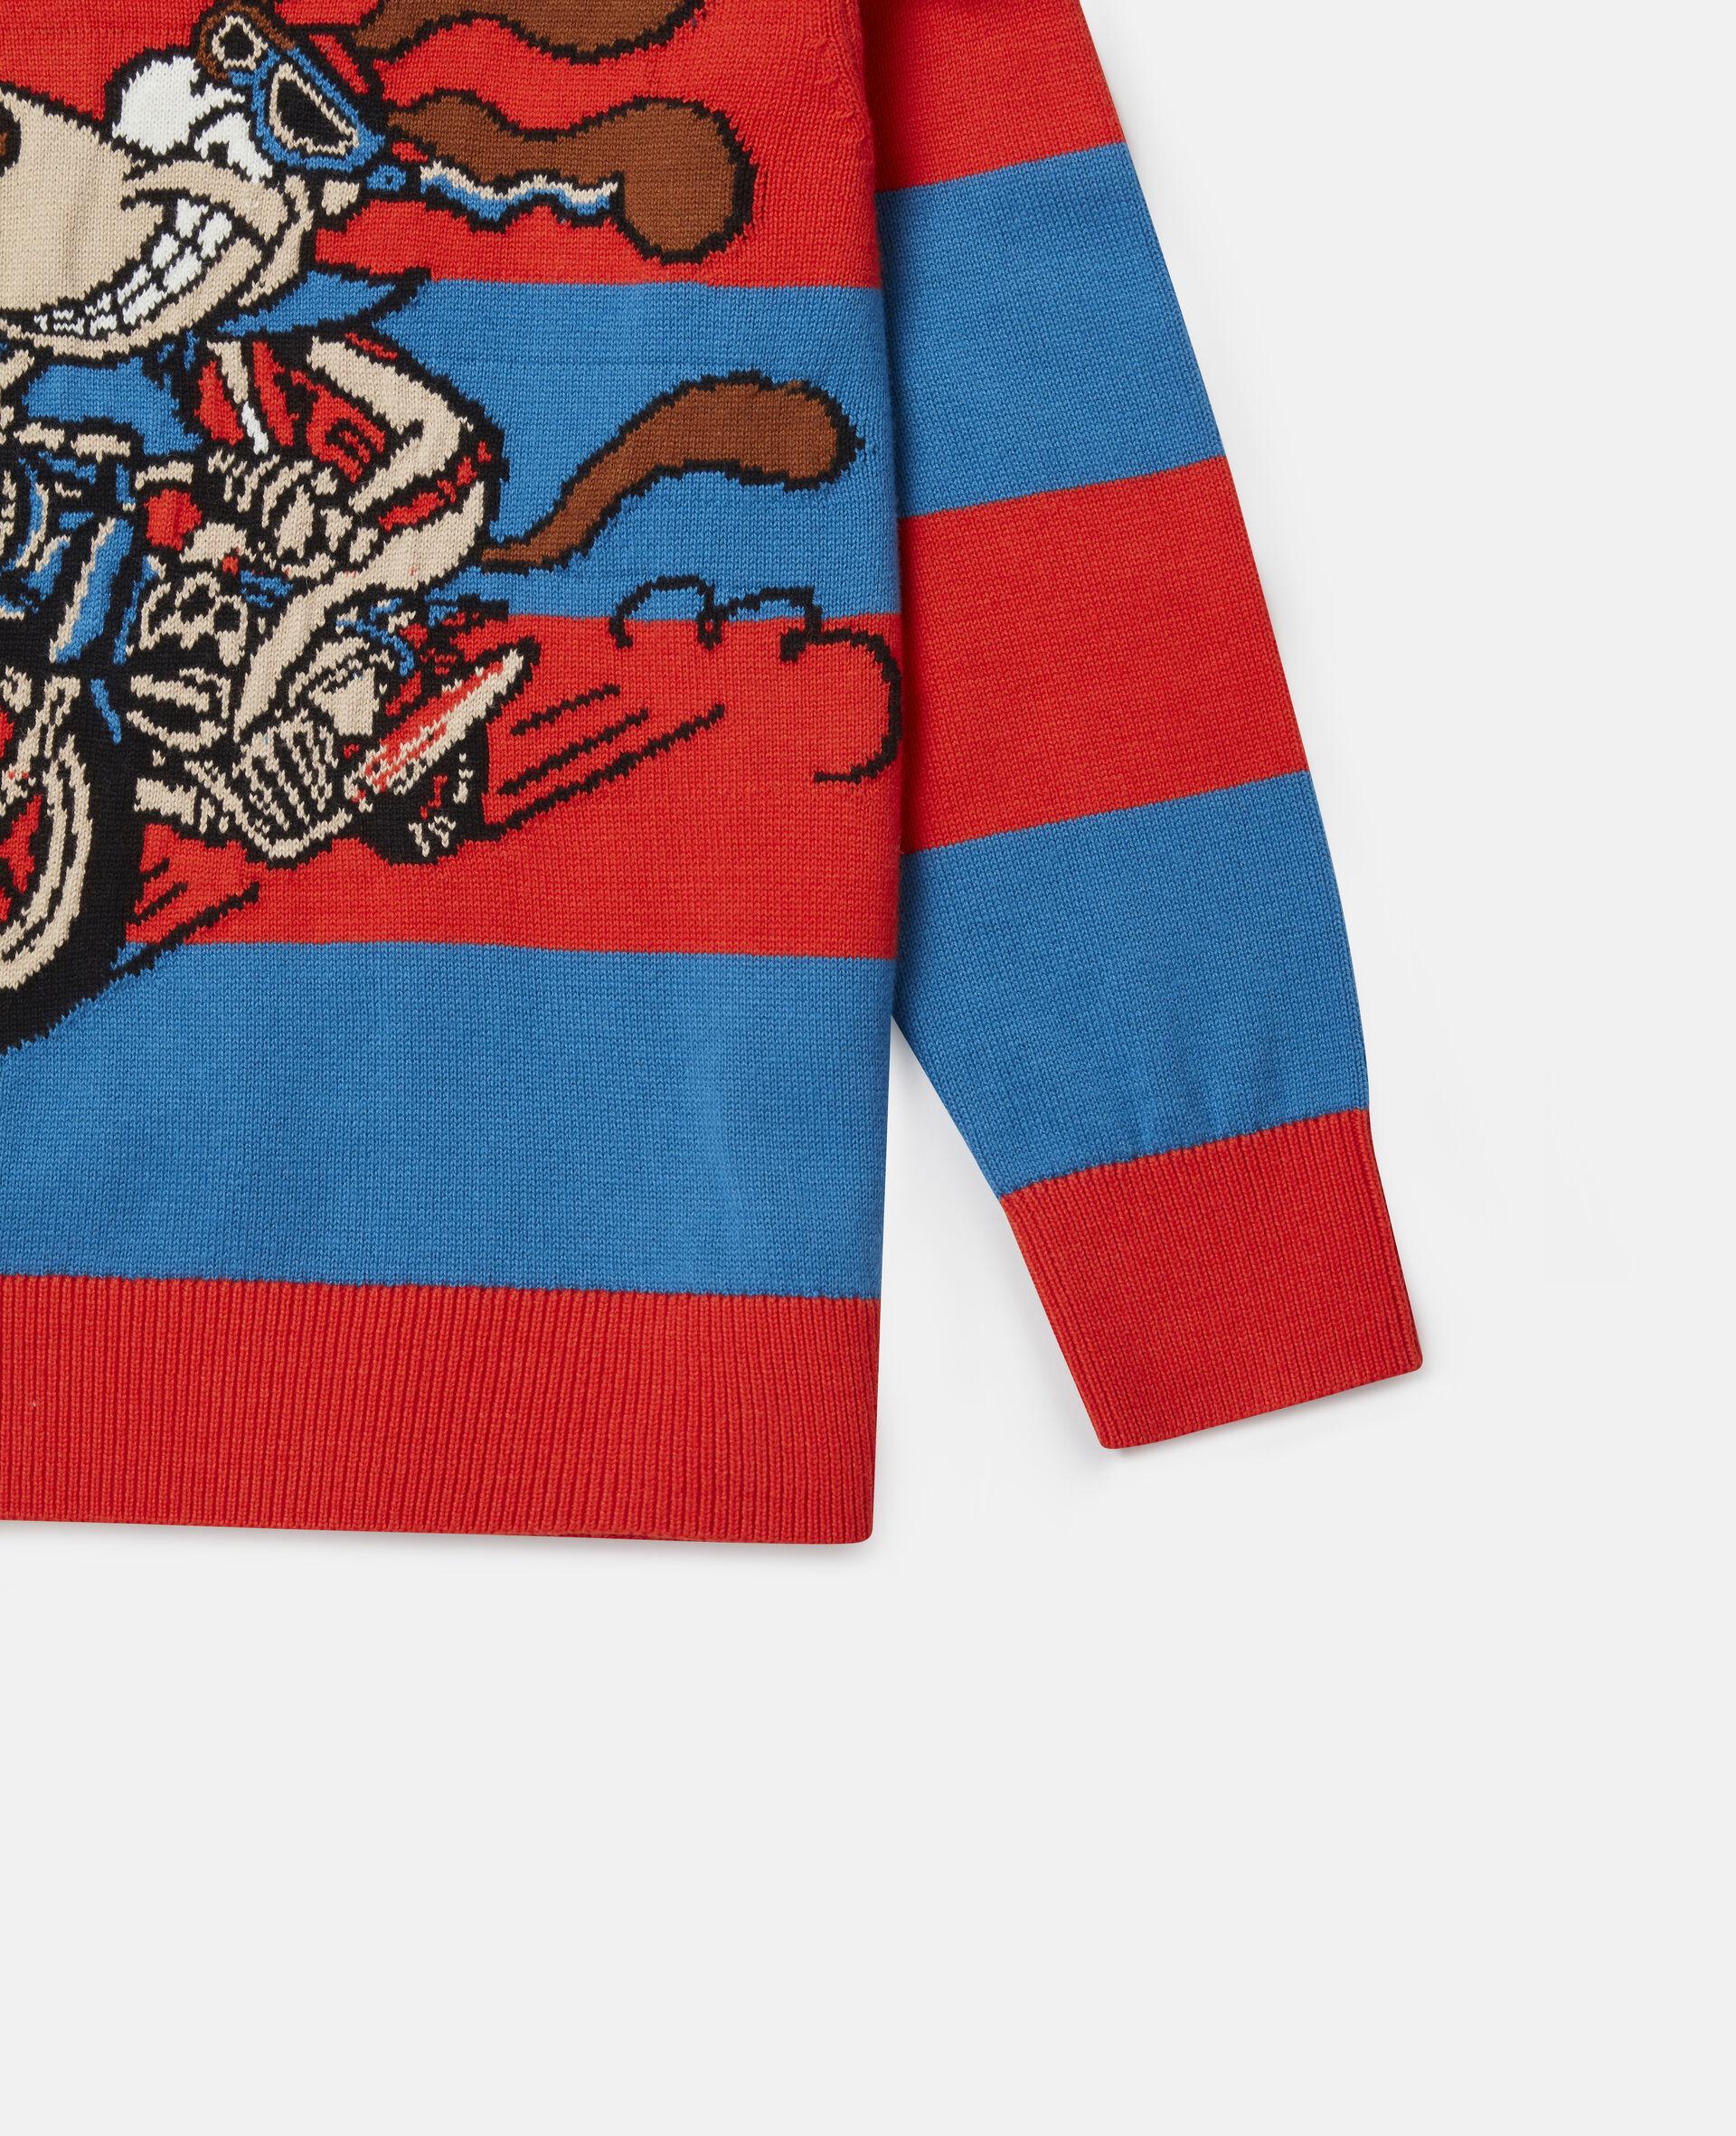 Crazy Dog Oversized Knit Intarsia Jumper-Multicolour-large image number 2